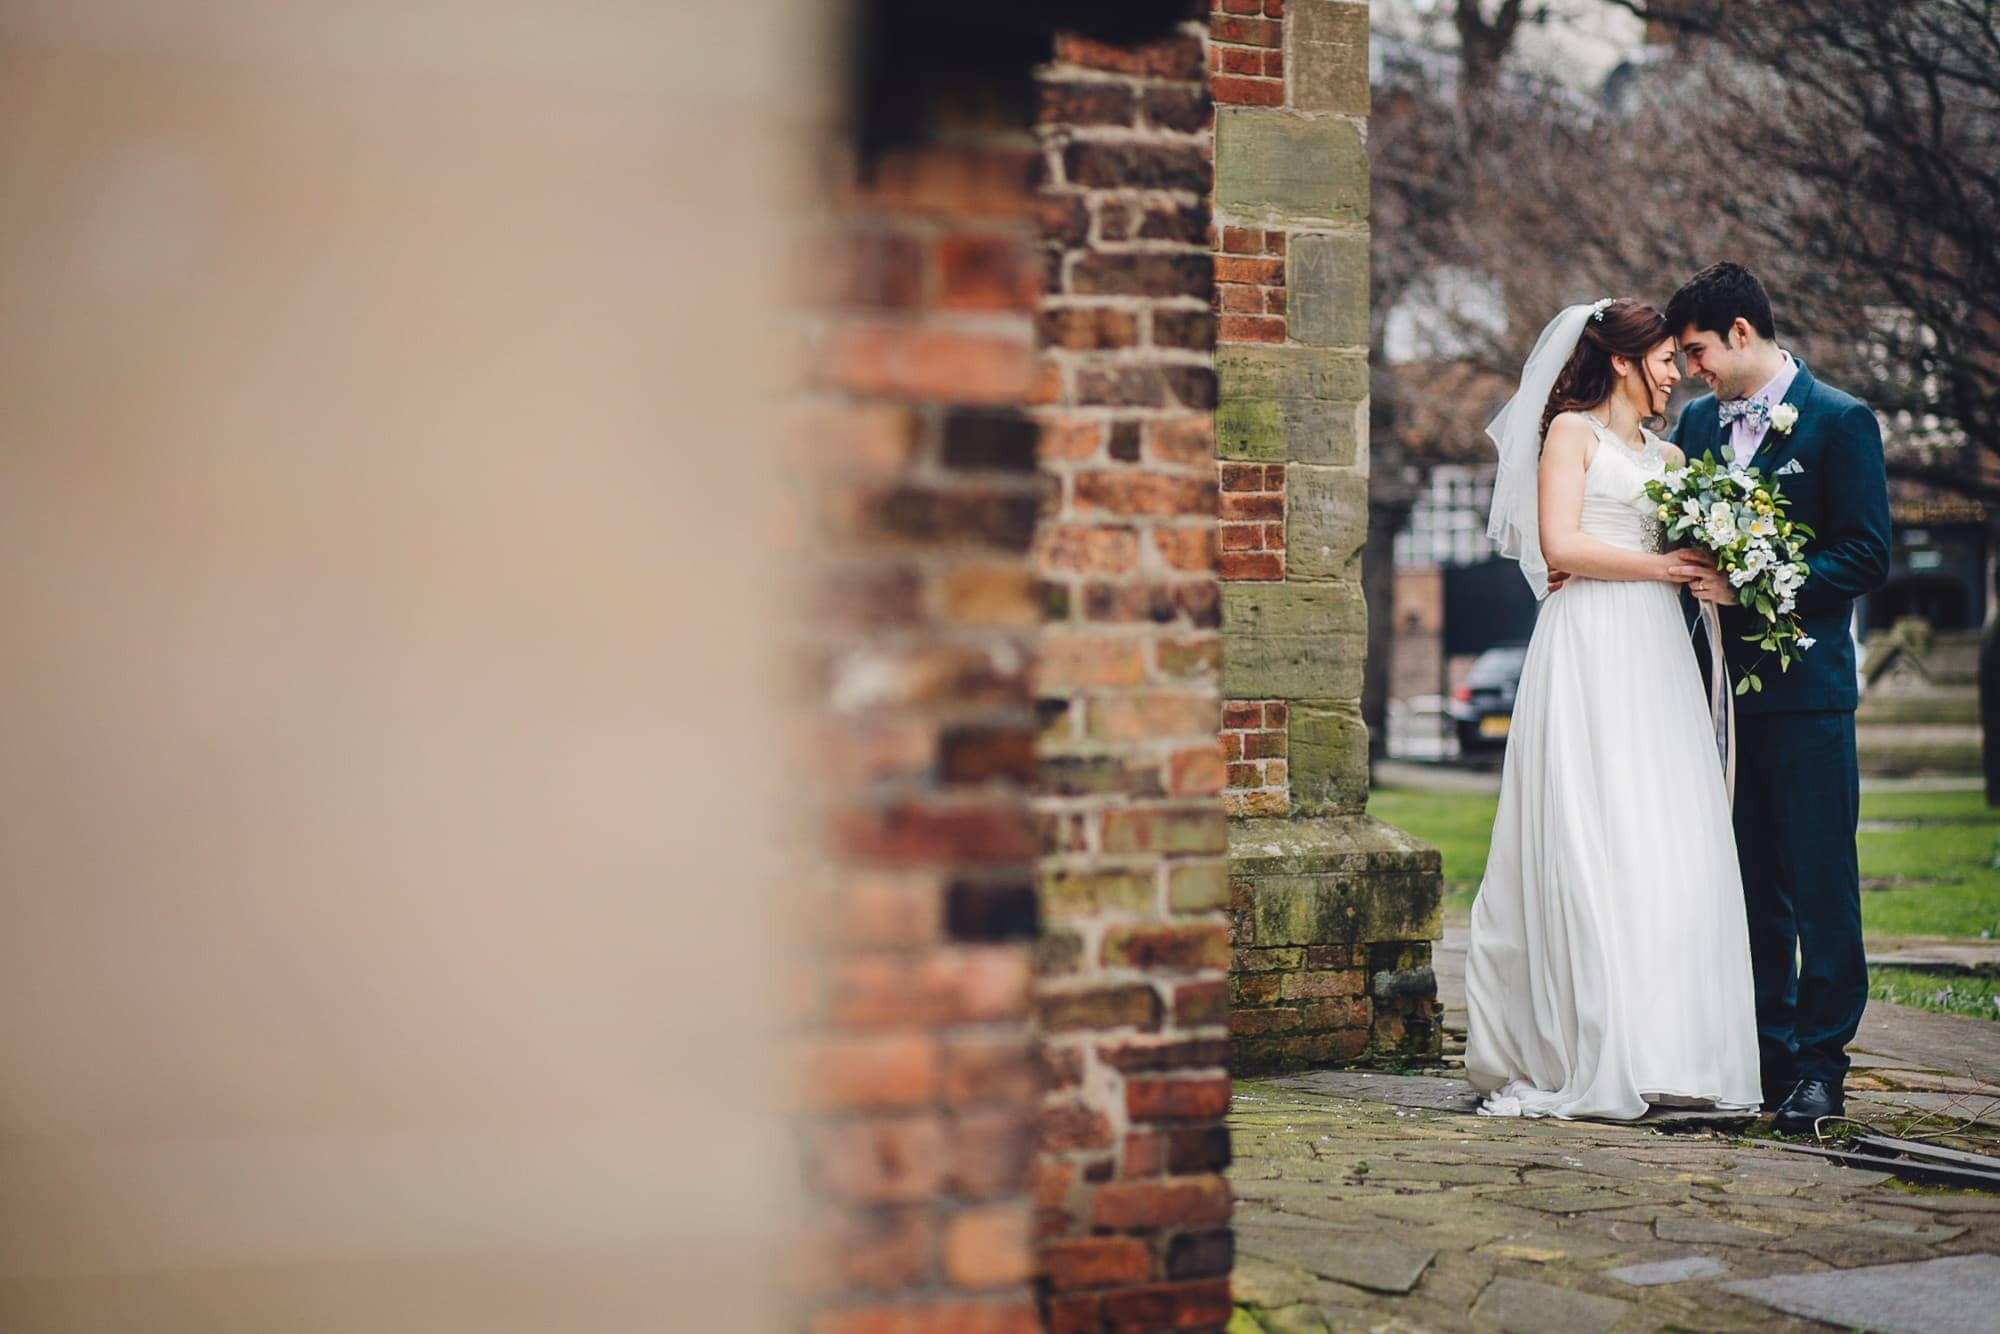 Matlt-Cross-Nottingham-wedding-Photography-31